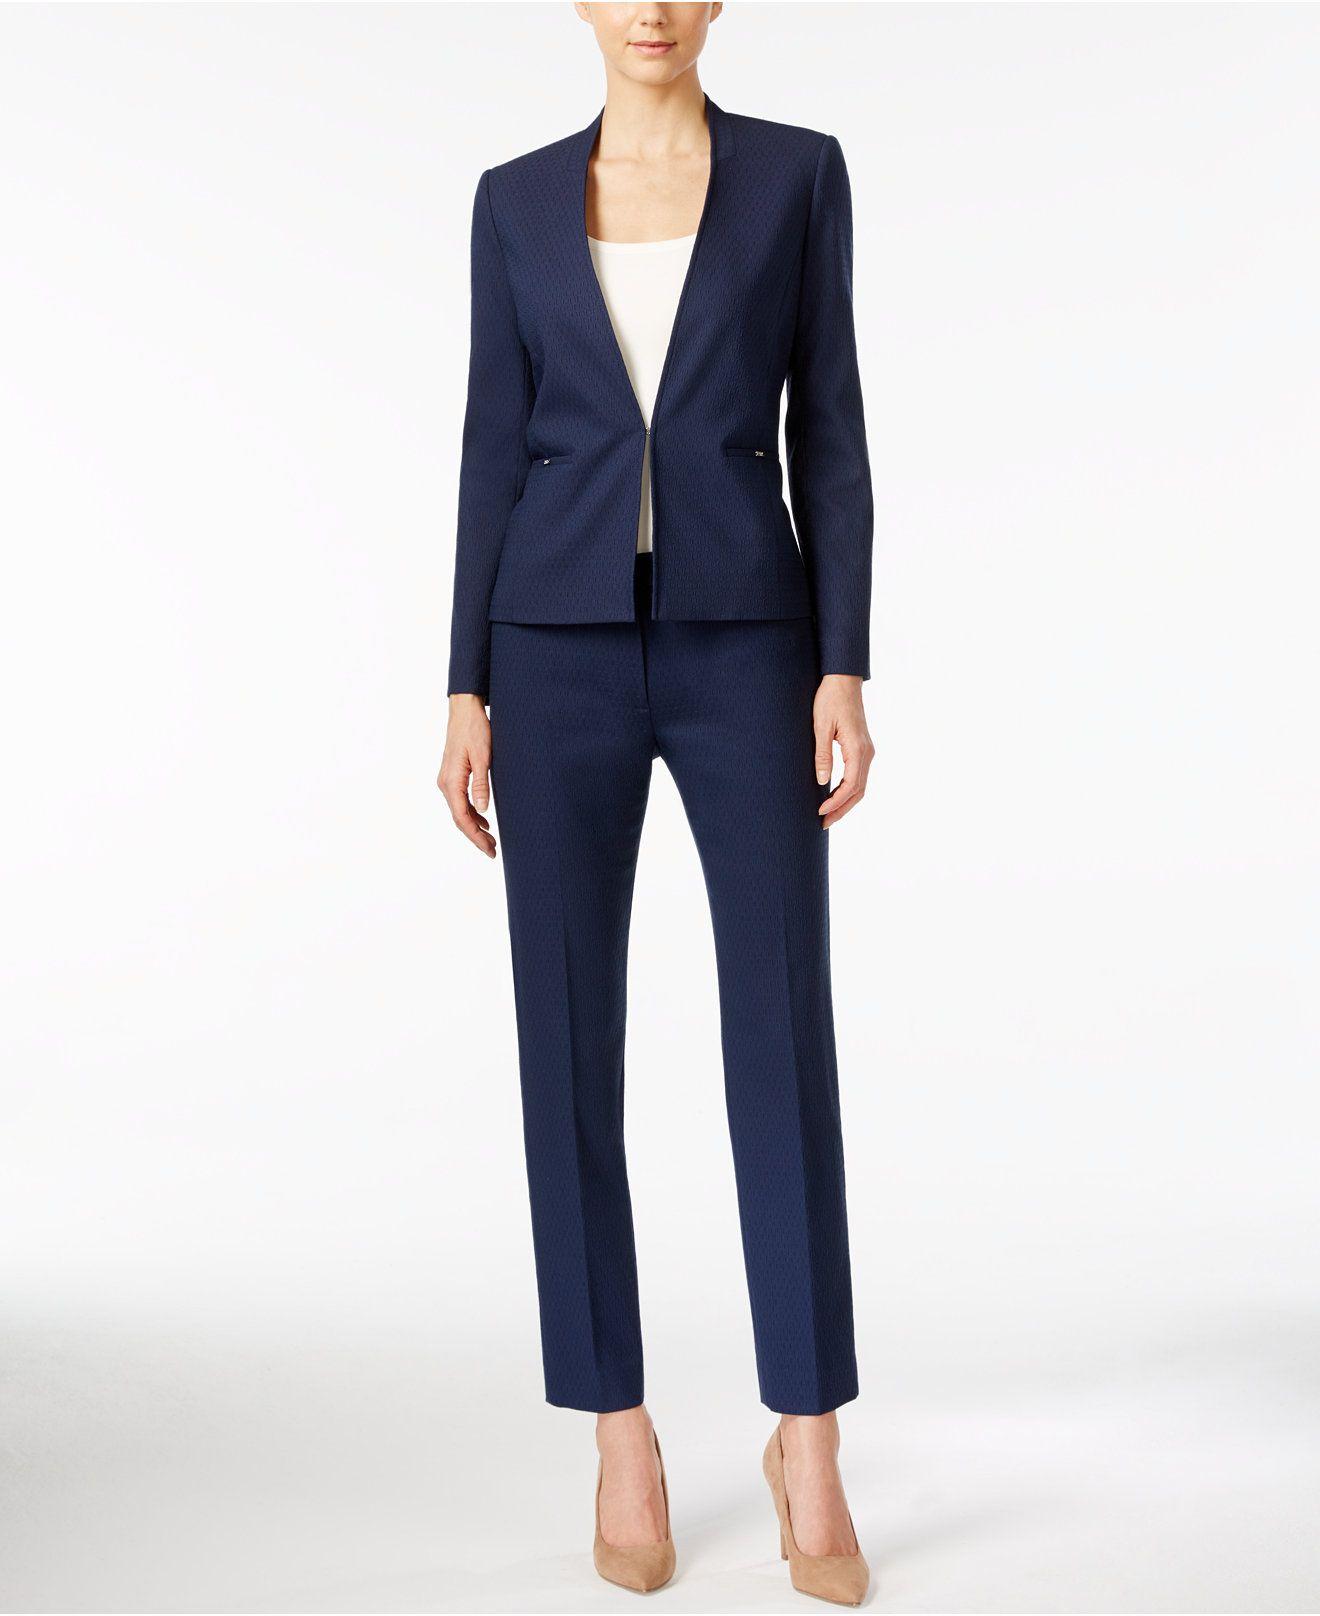 Tahari ASL Textured Jacquard Collarless Blazer & Trousers - Wear ...